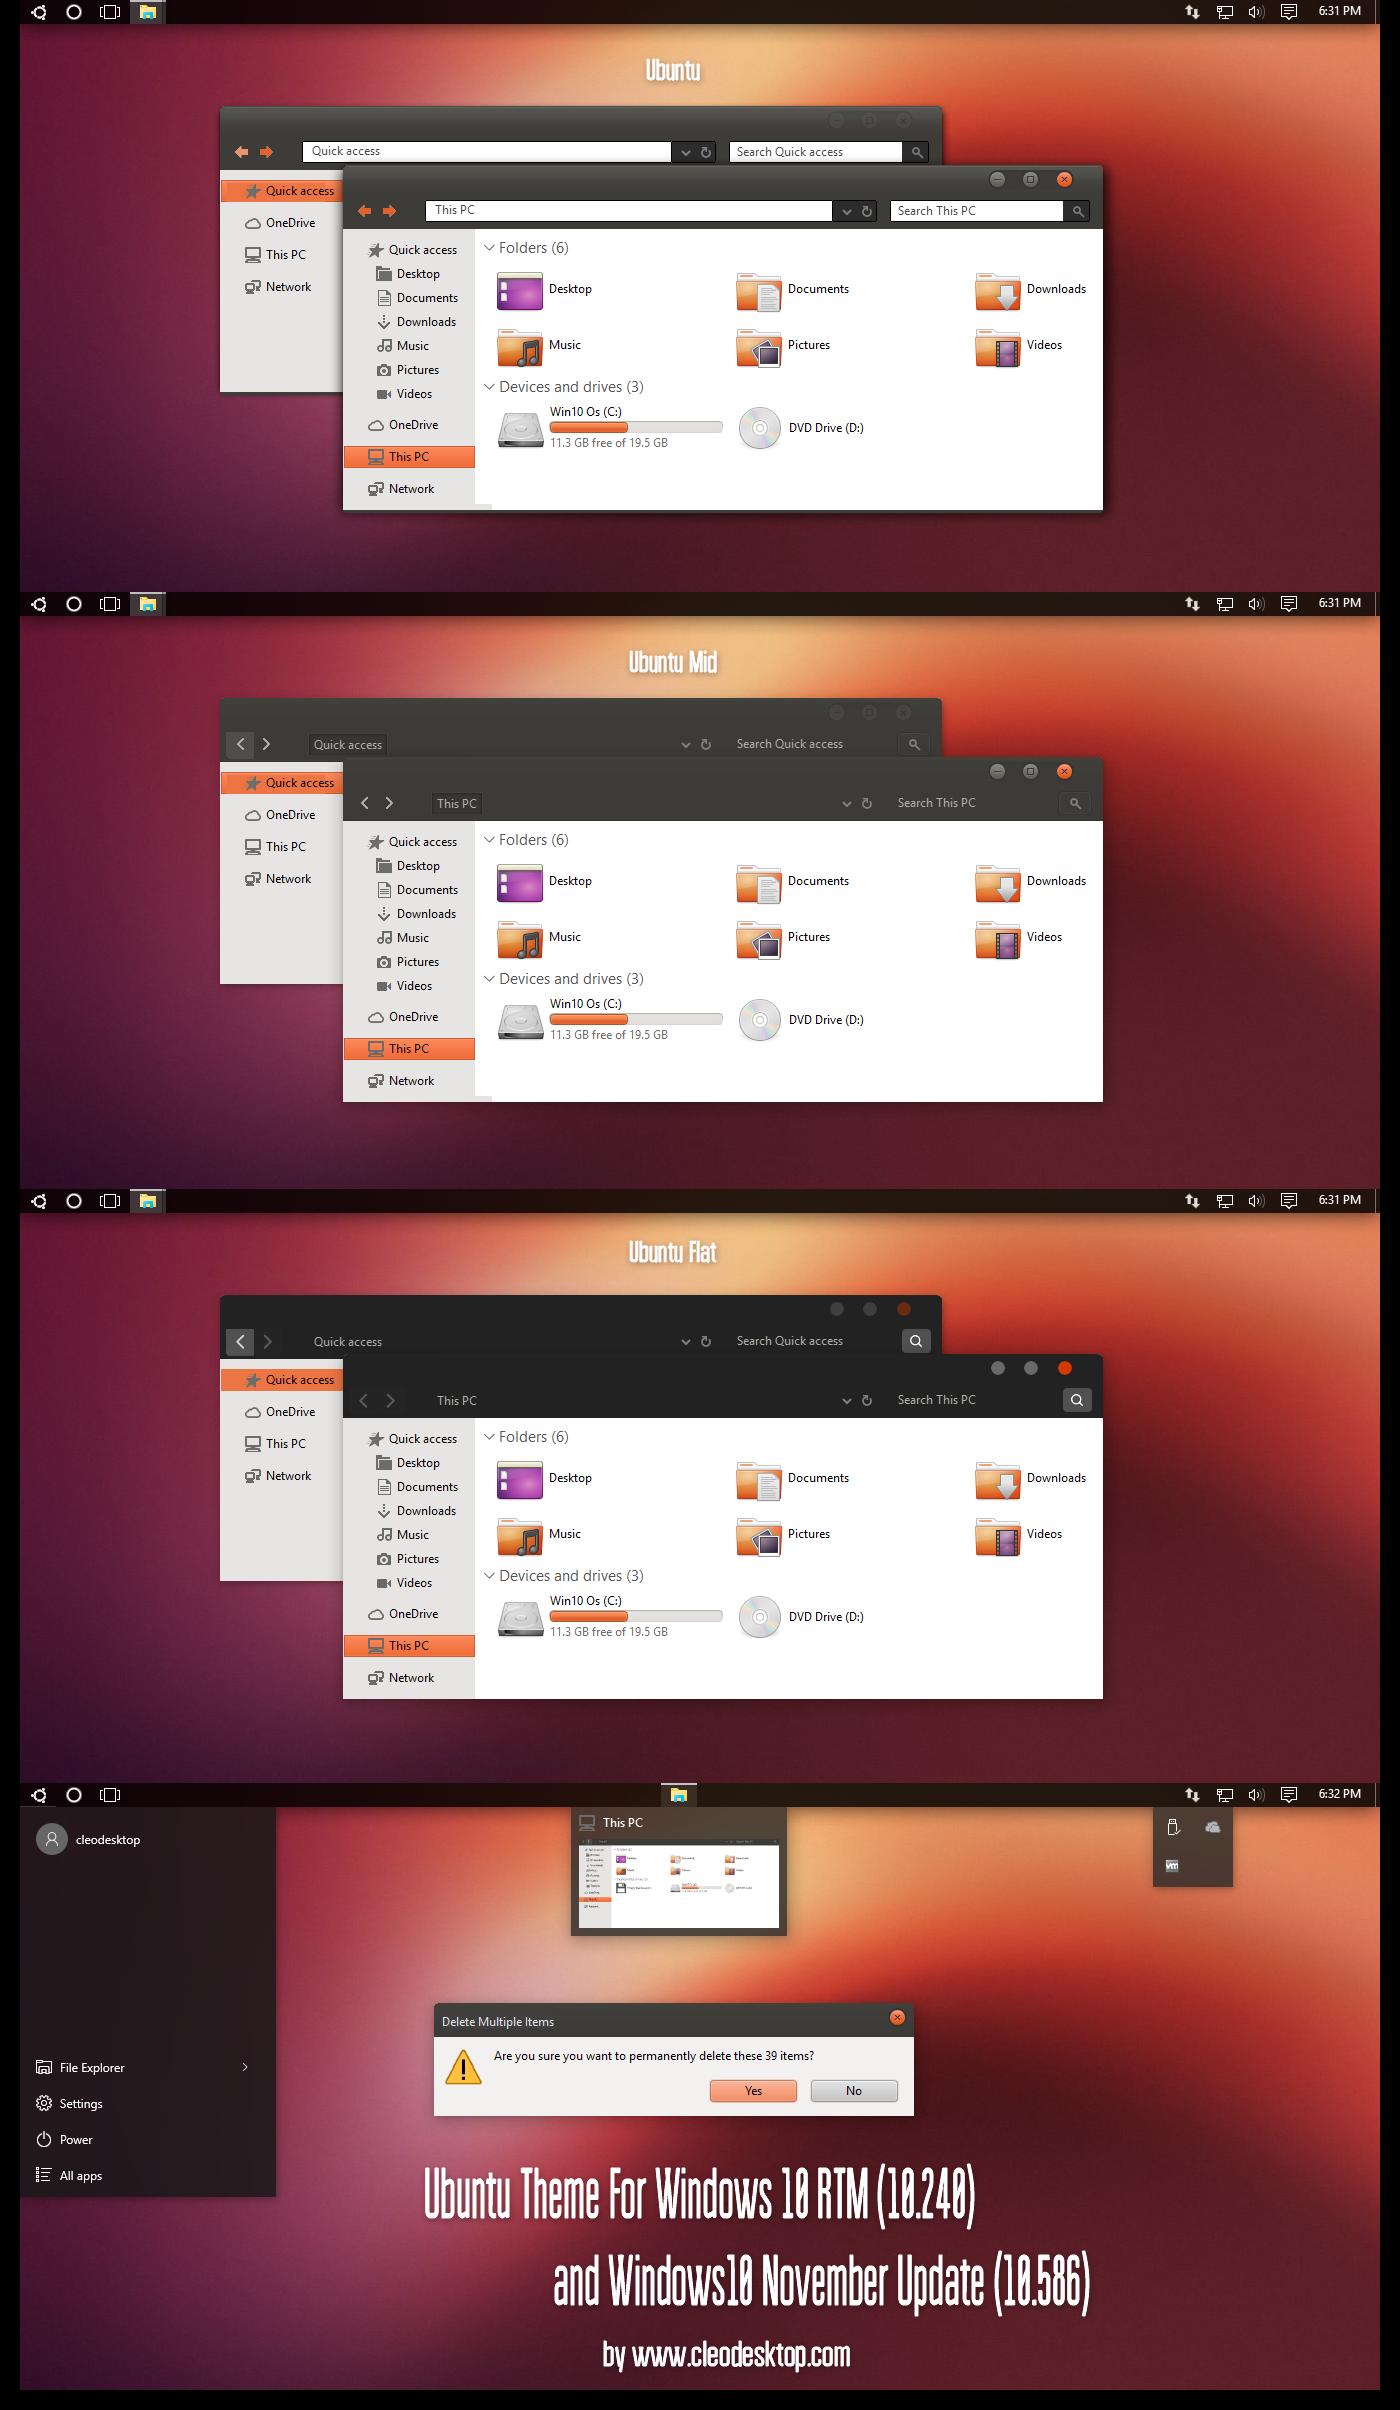 Ubuntu Theme For Windows 10 November Update